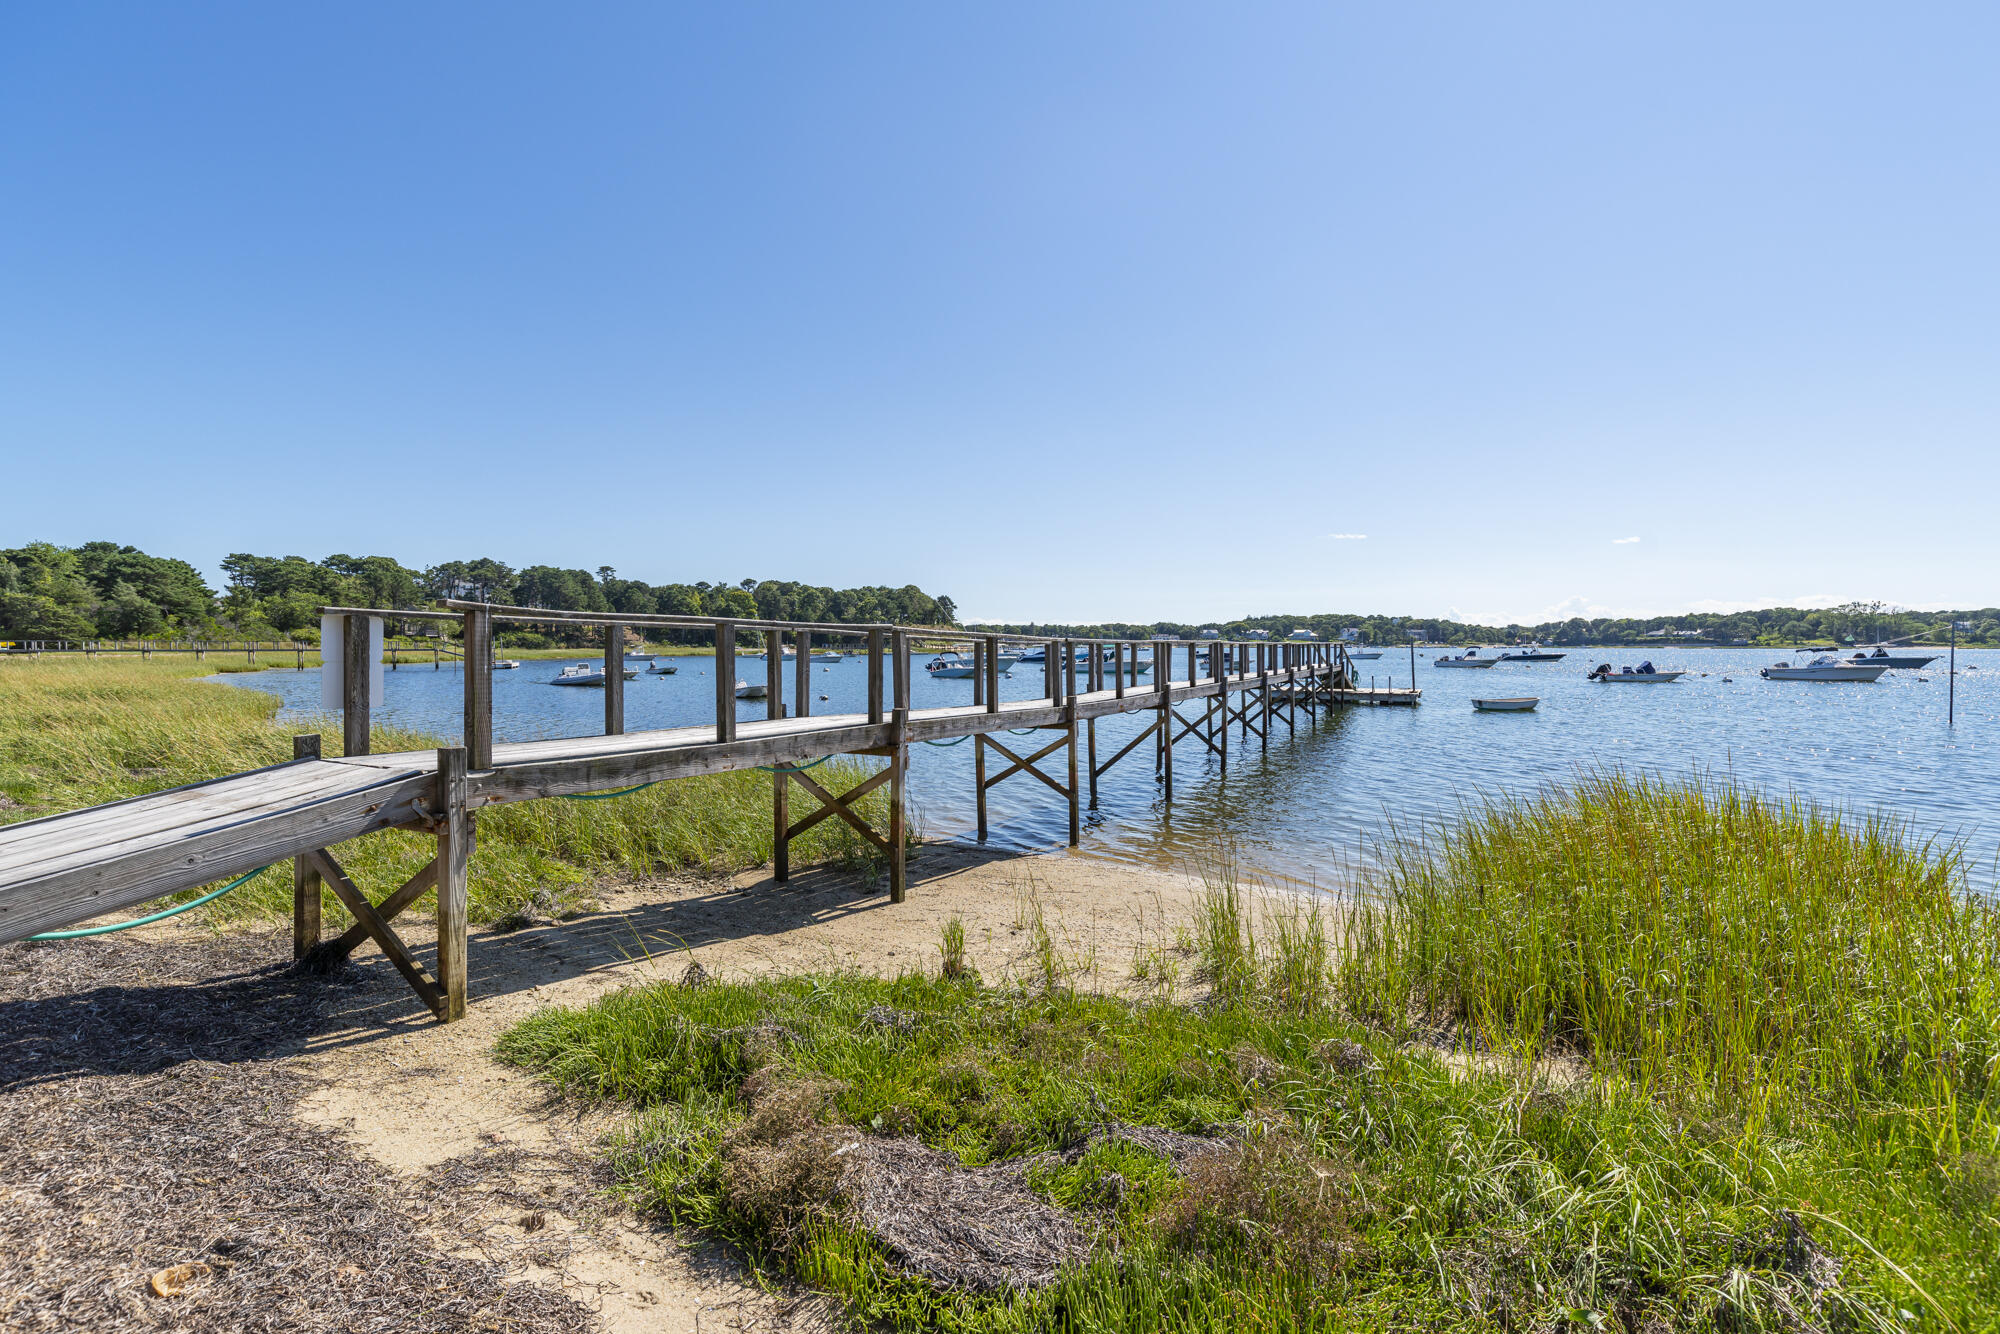 69 Strong Island Road, Chatham, MA  02633 - slide 41